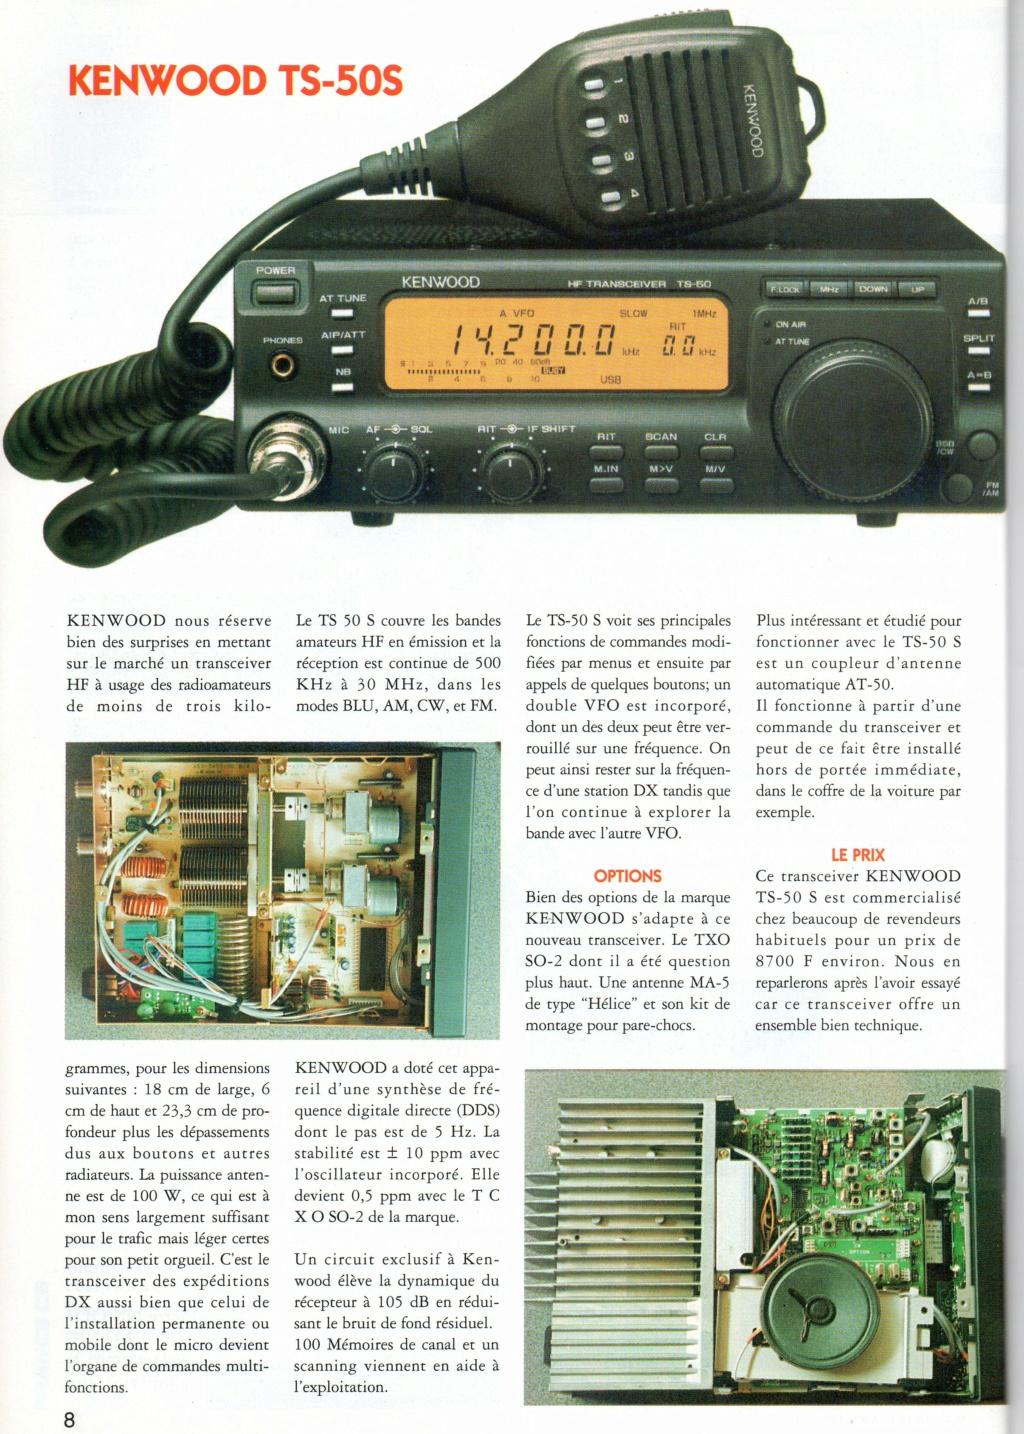 Kenwood TS-50 Chora671